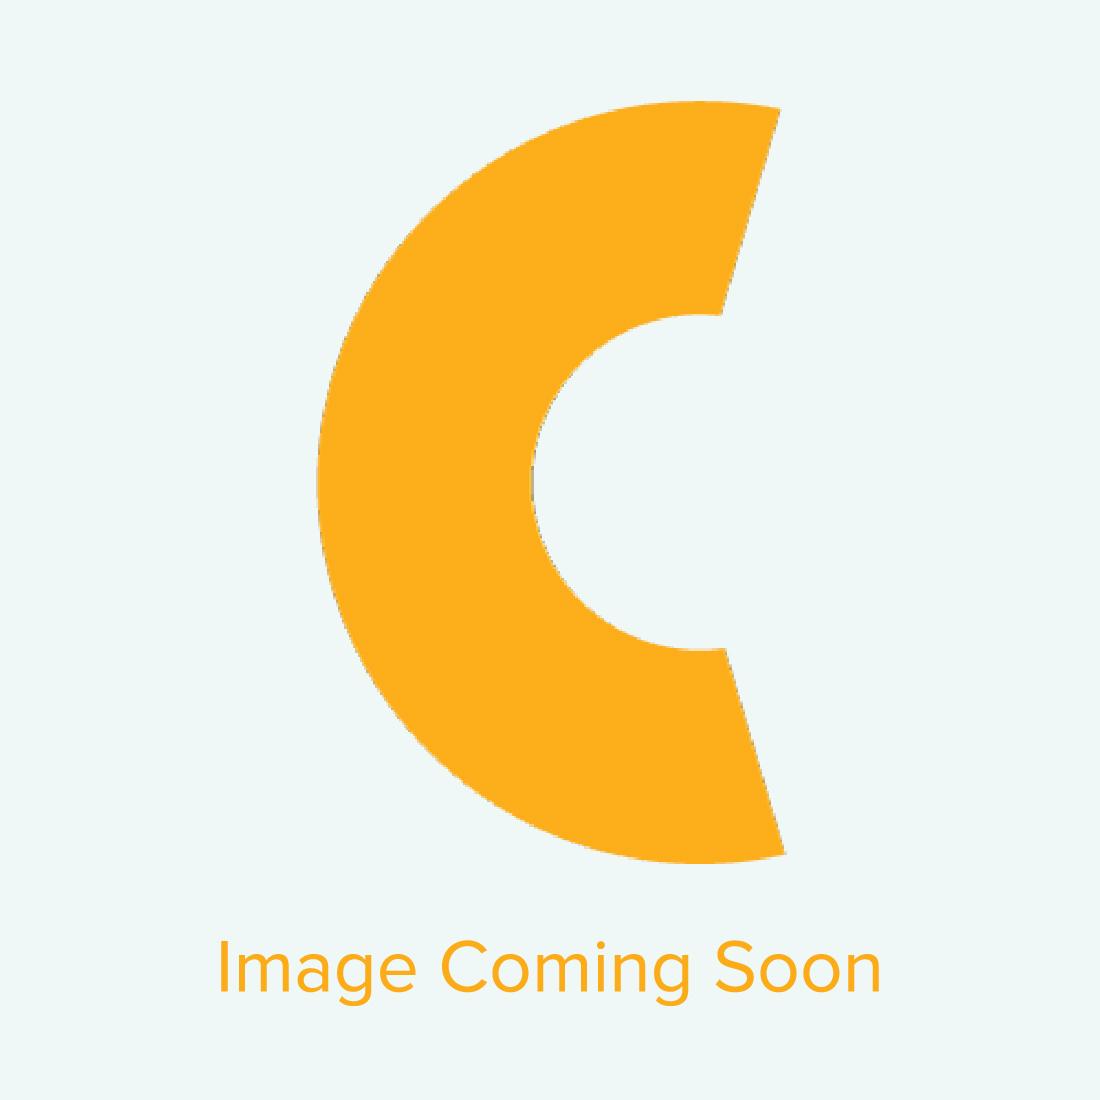 "Epson SureColor F6370 44"" Wide Format Dye Sublimation Printer (Standard Edition)"